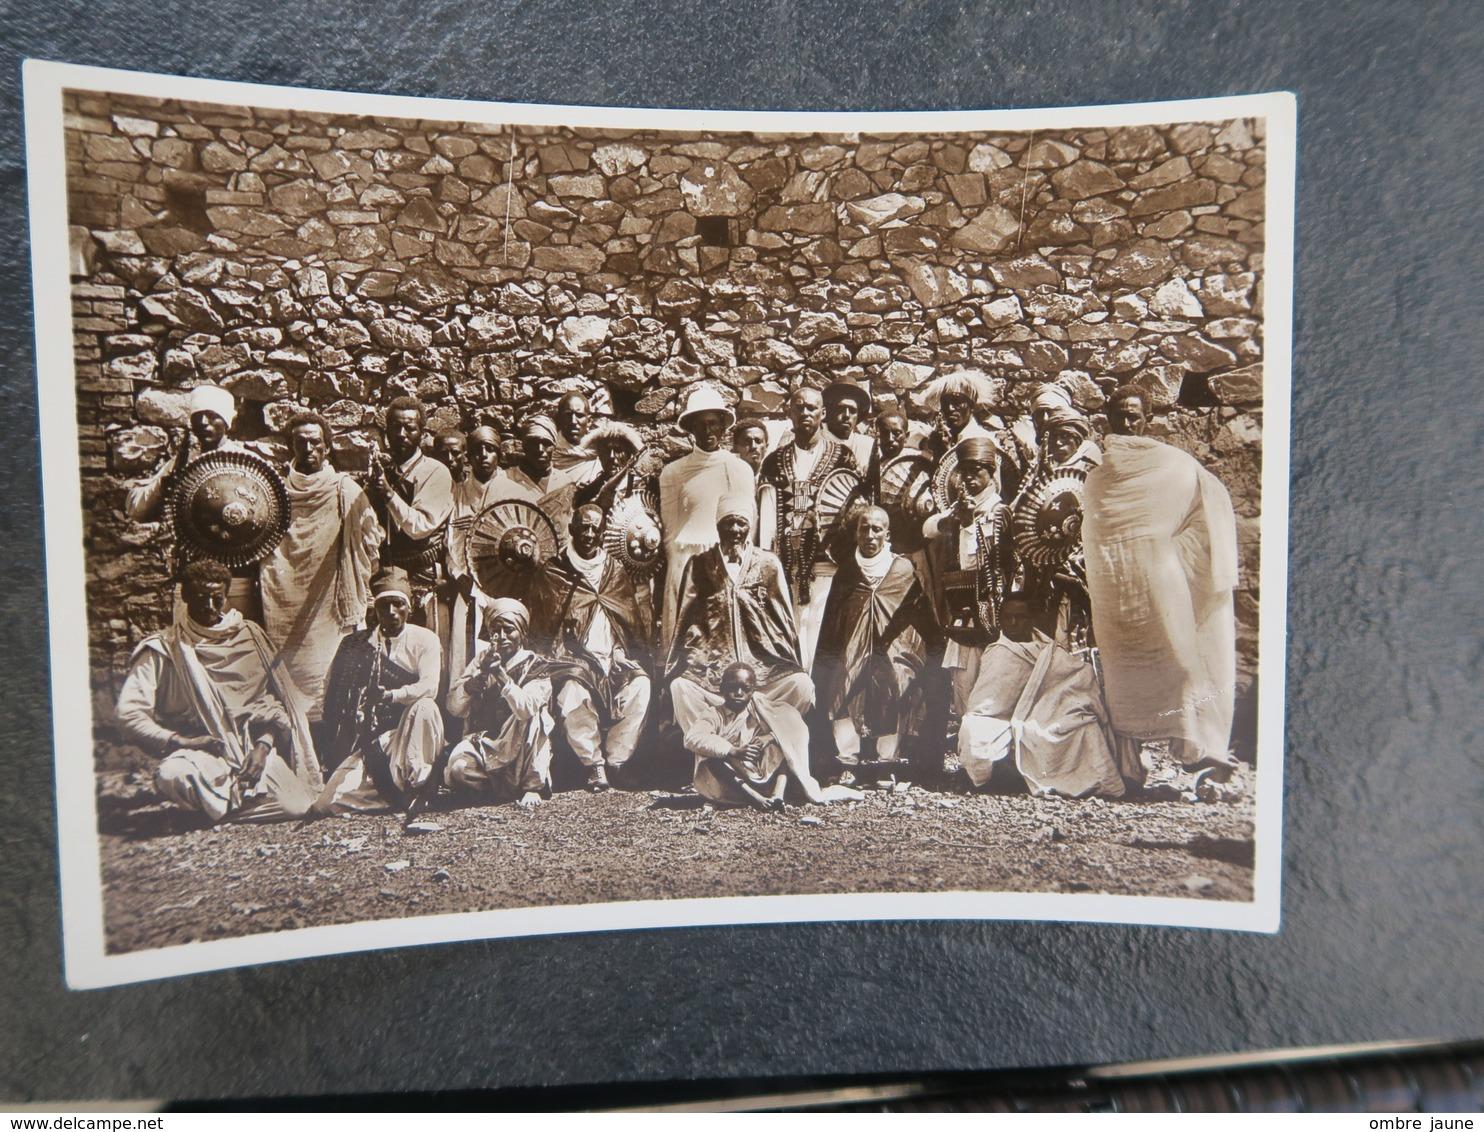 IT  - ERYTHREE - ERITREA - Un Capo Coi Suoi Armati - Un Chef Avec Ses Hommes Armés - Eritrea